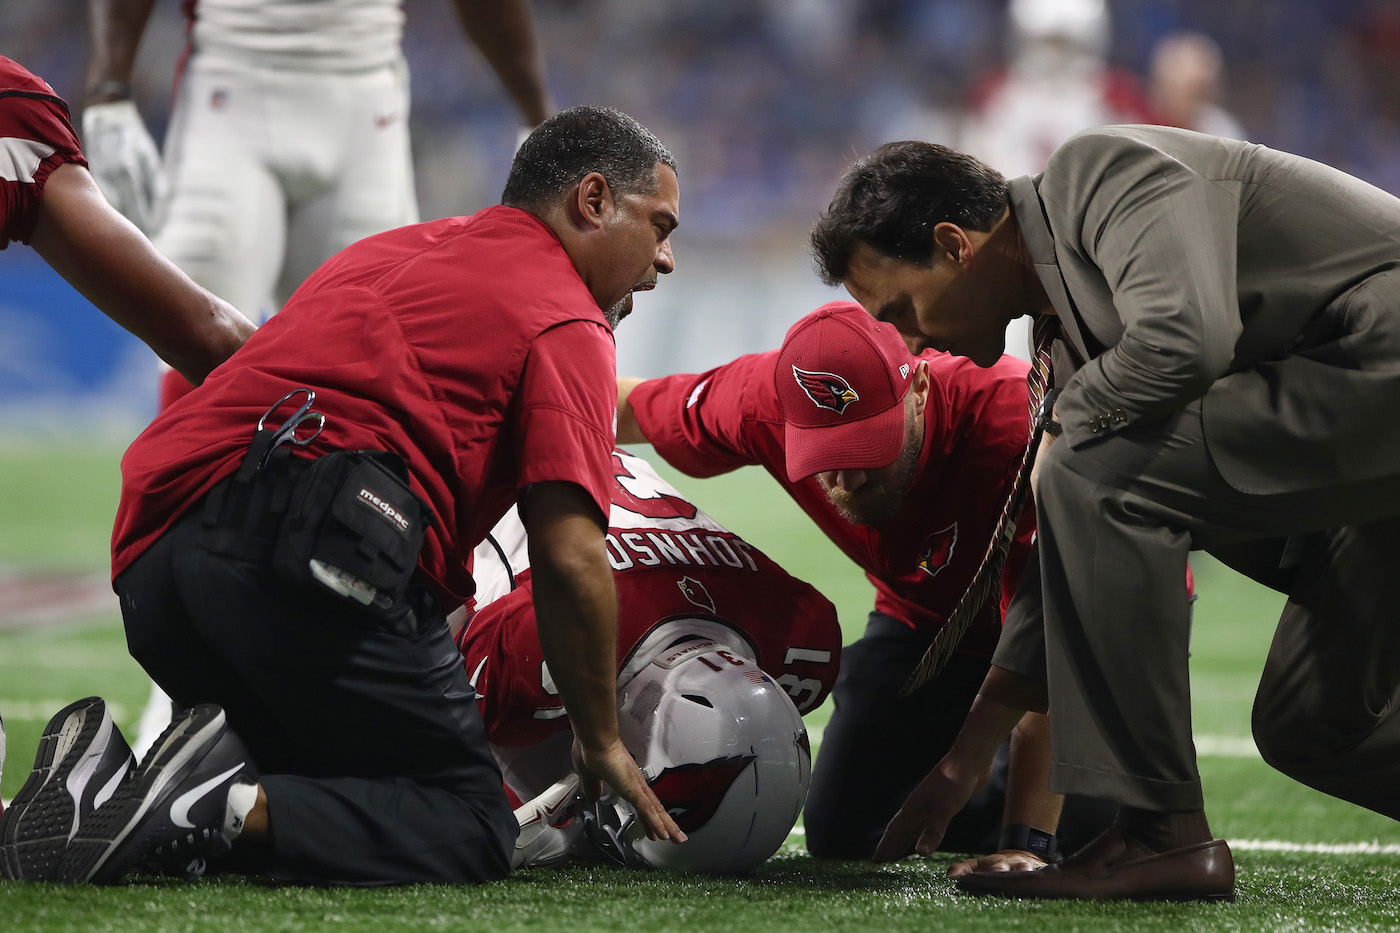 David Johnson Suffers Wrist Injury vs. Lions